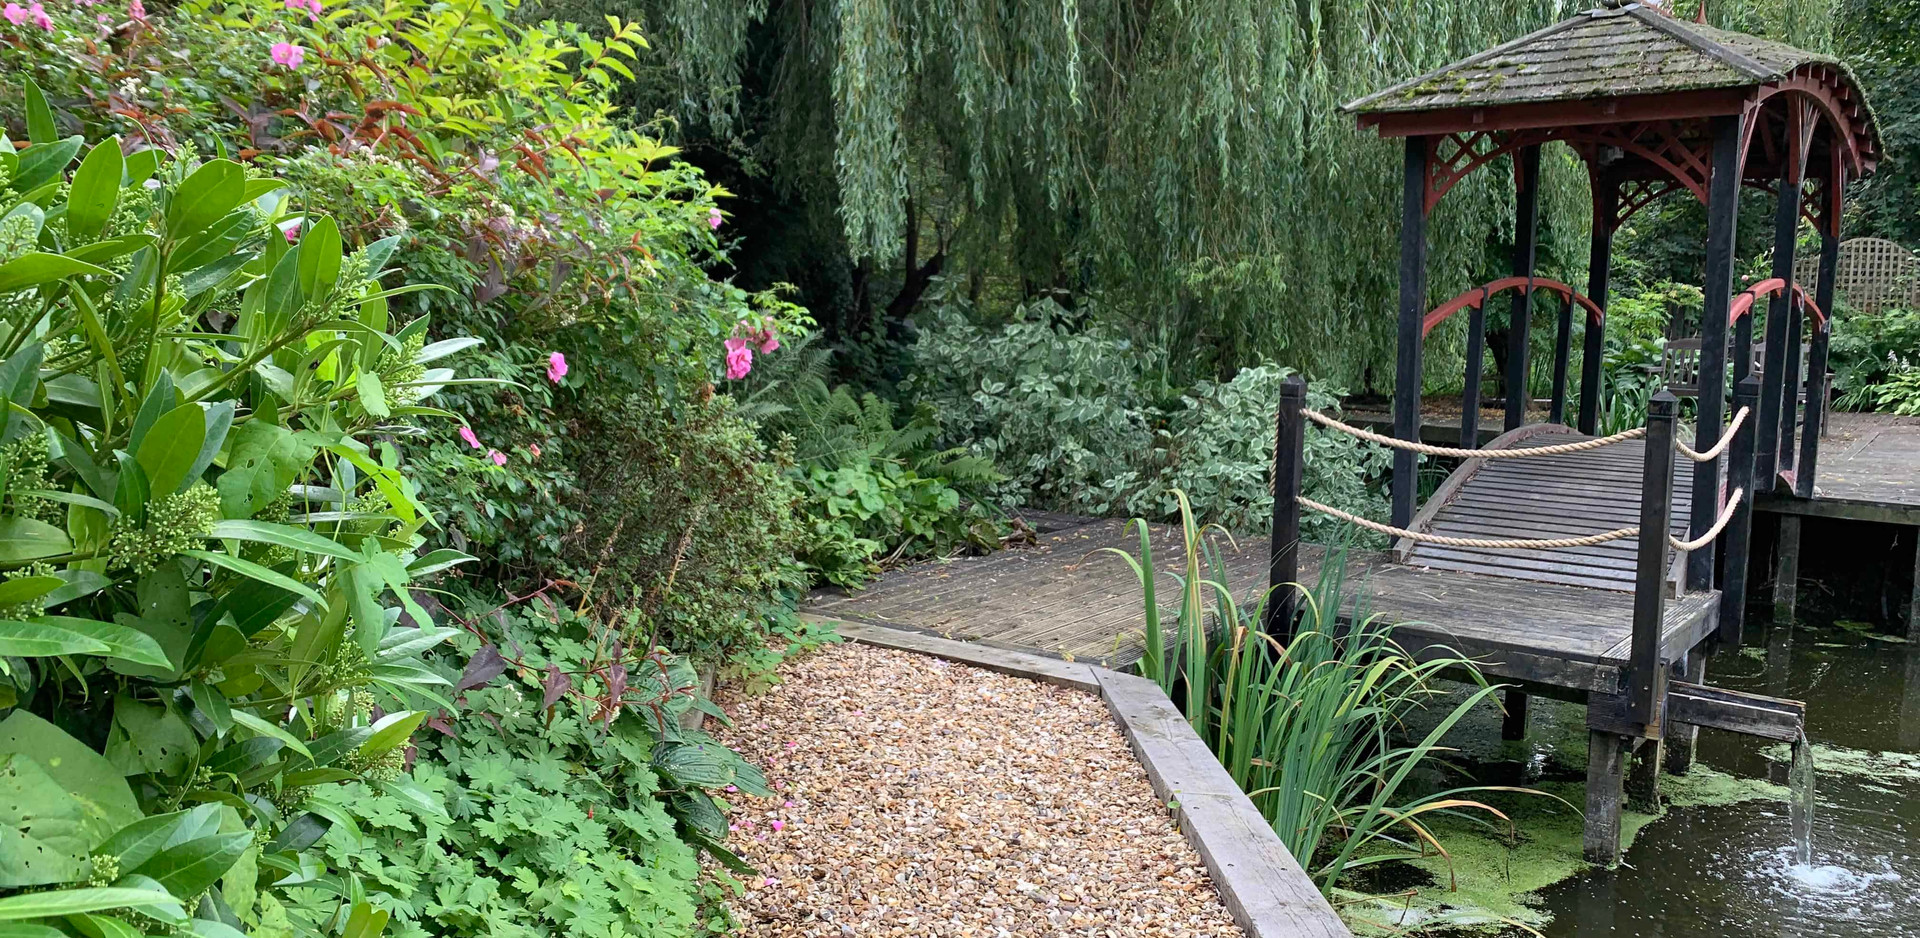 Newel posts with oak sleepers and decking boards in Burton Joyce